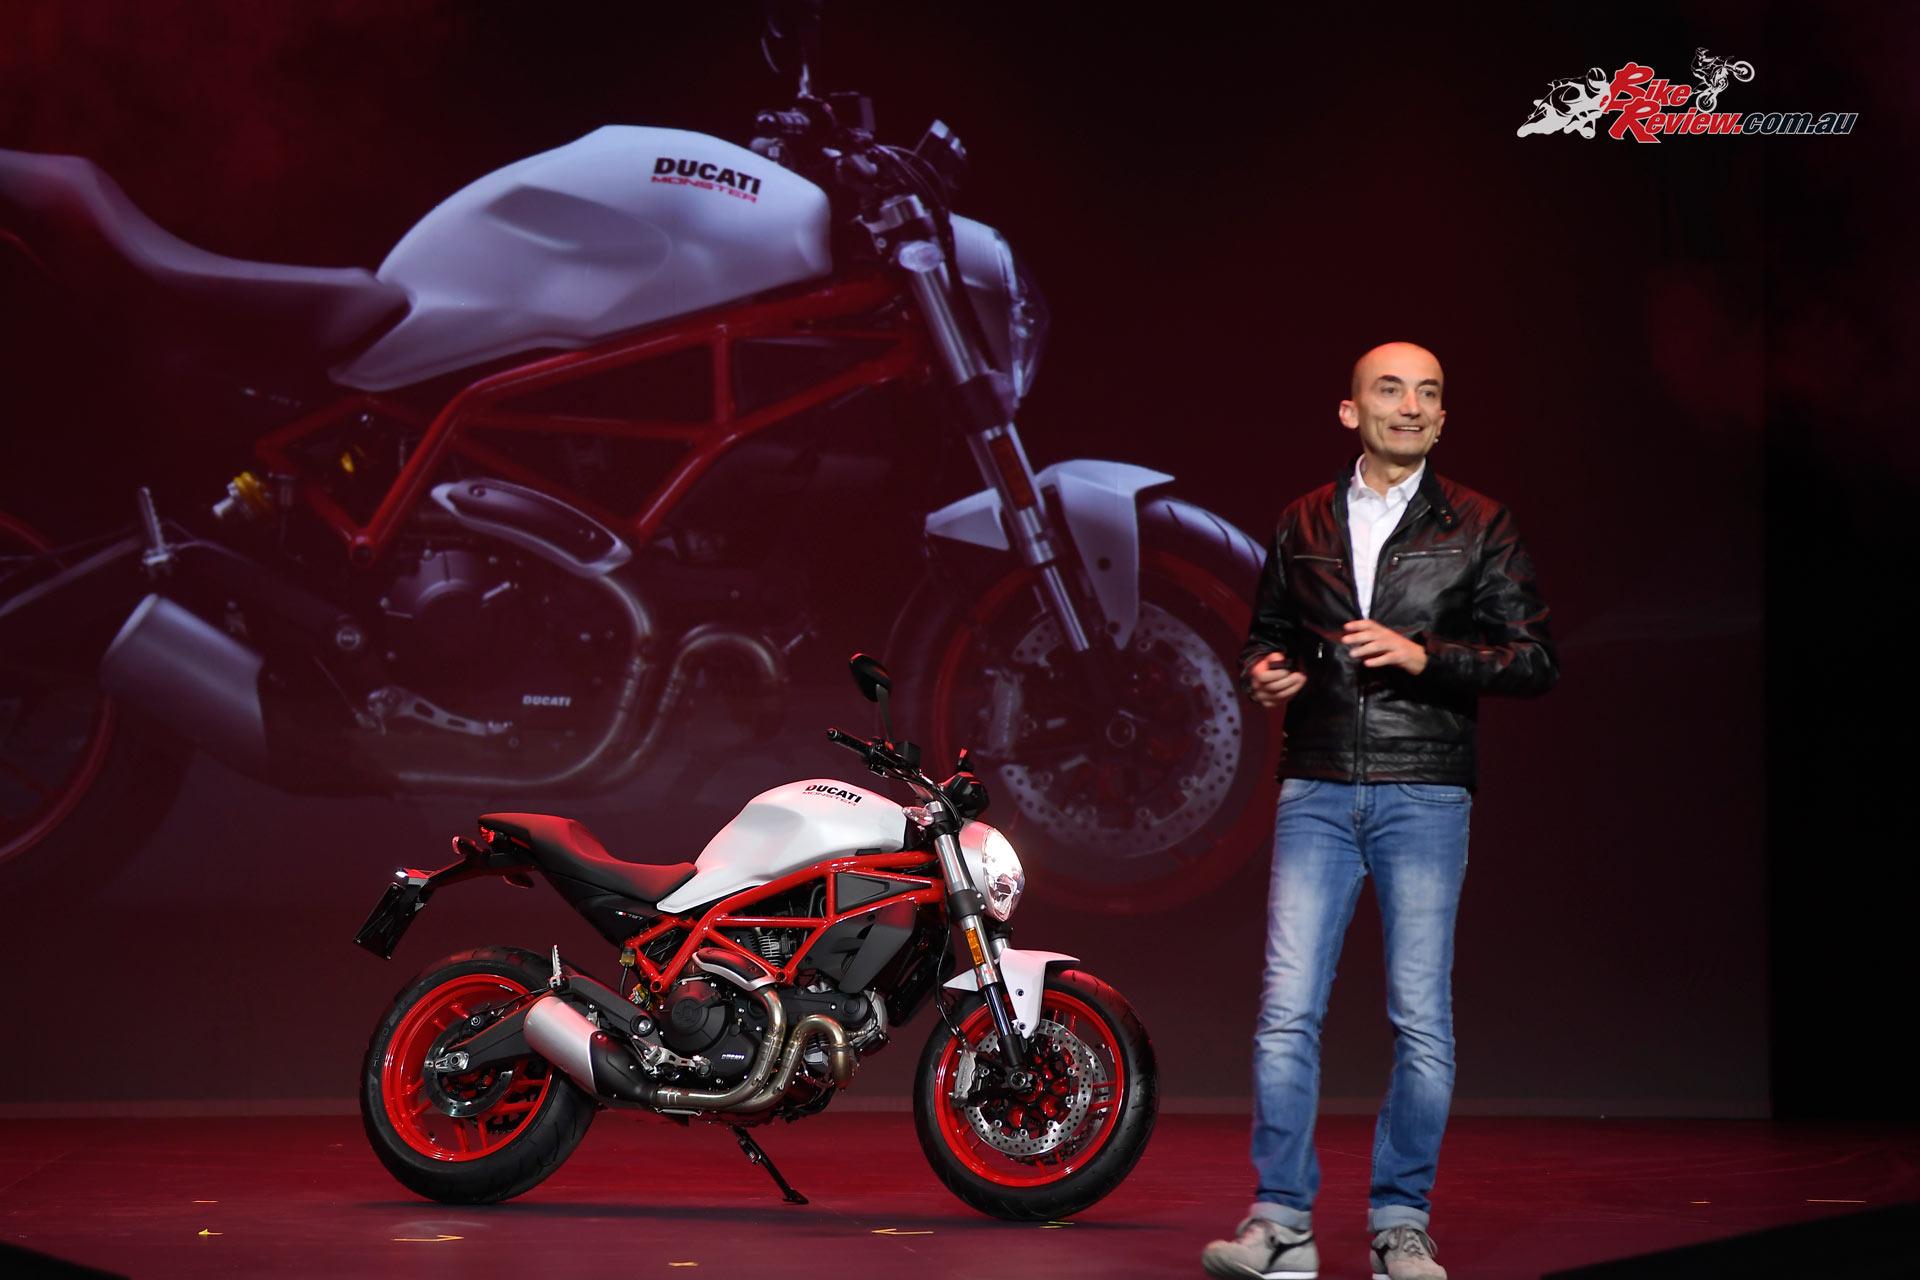 2017 Ducati Monster 797 revealed at EICMA